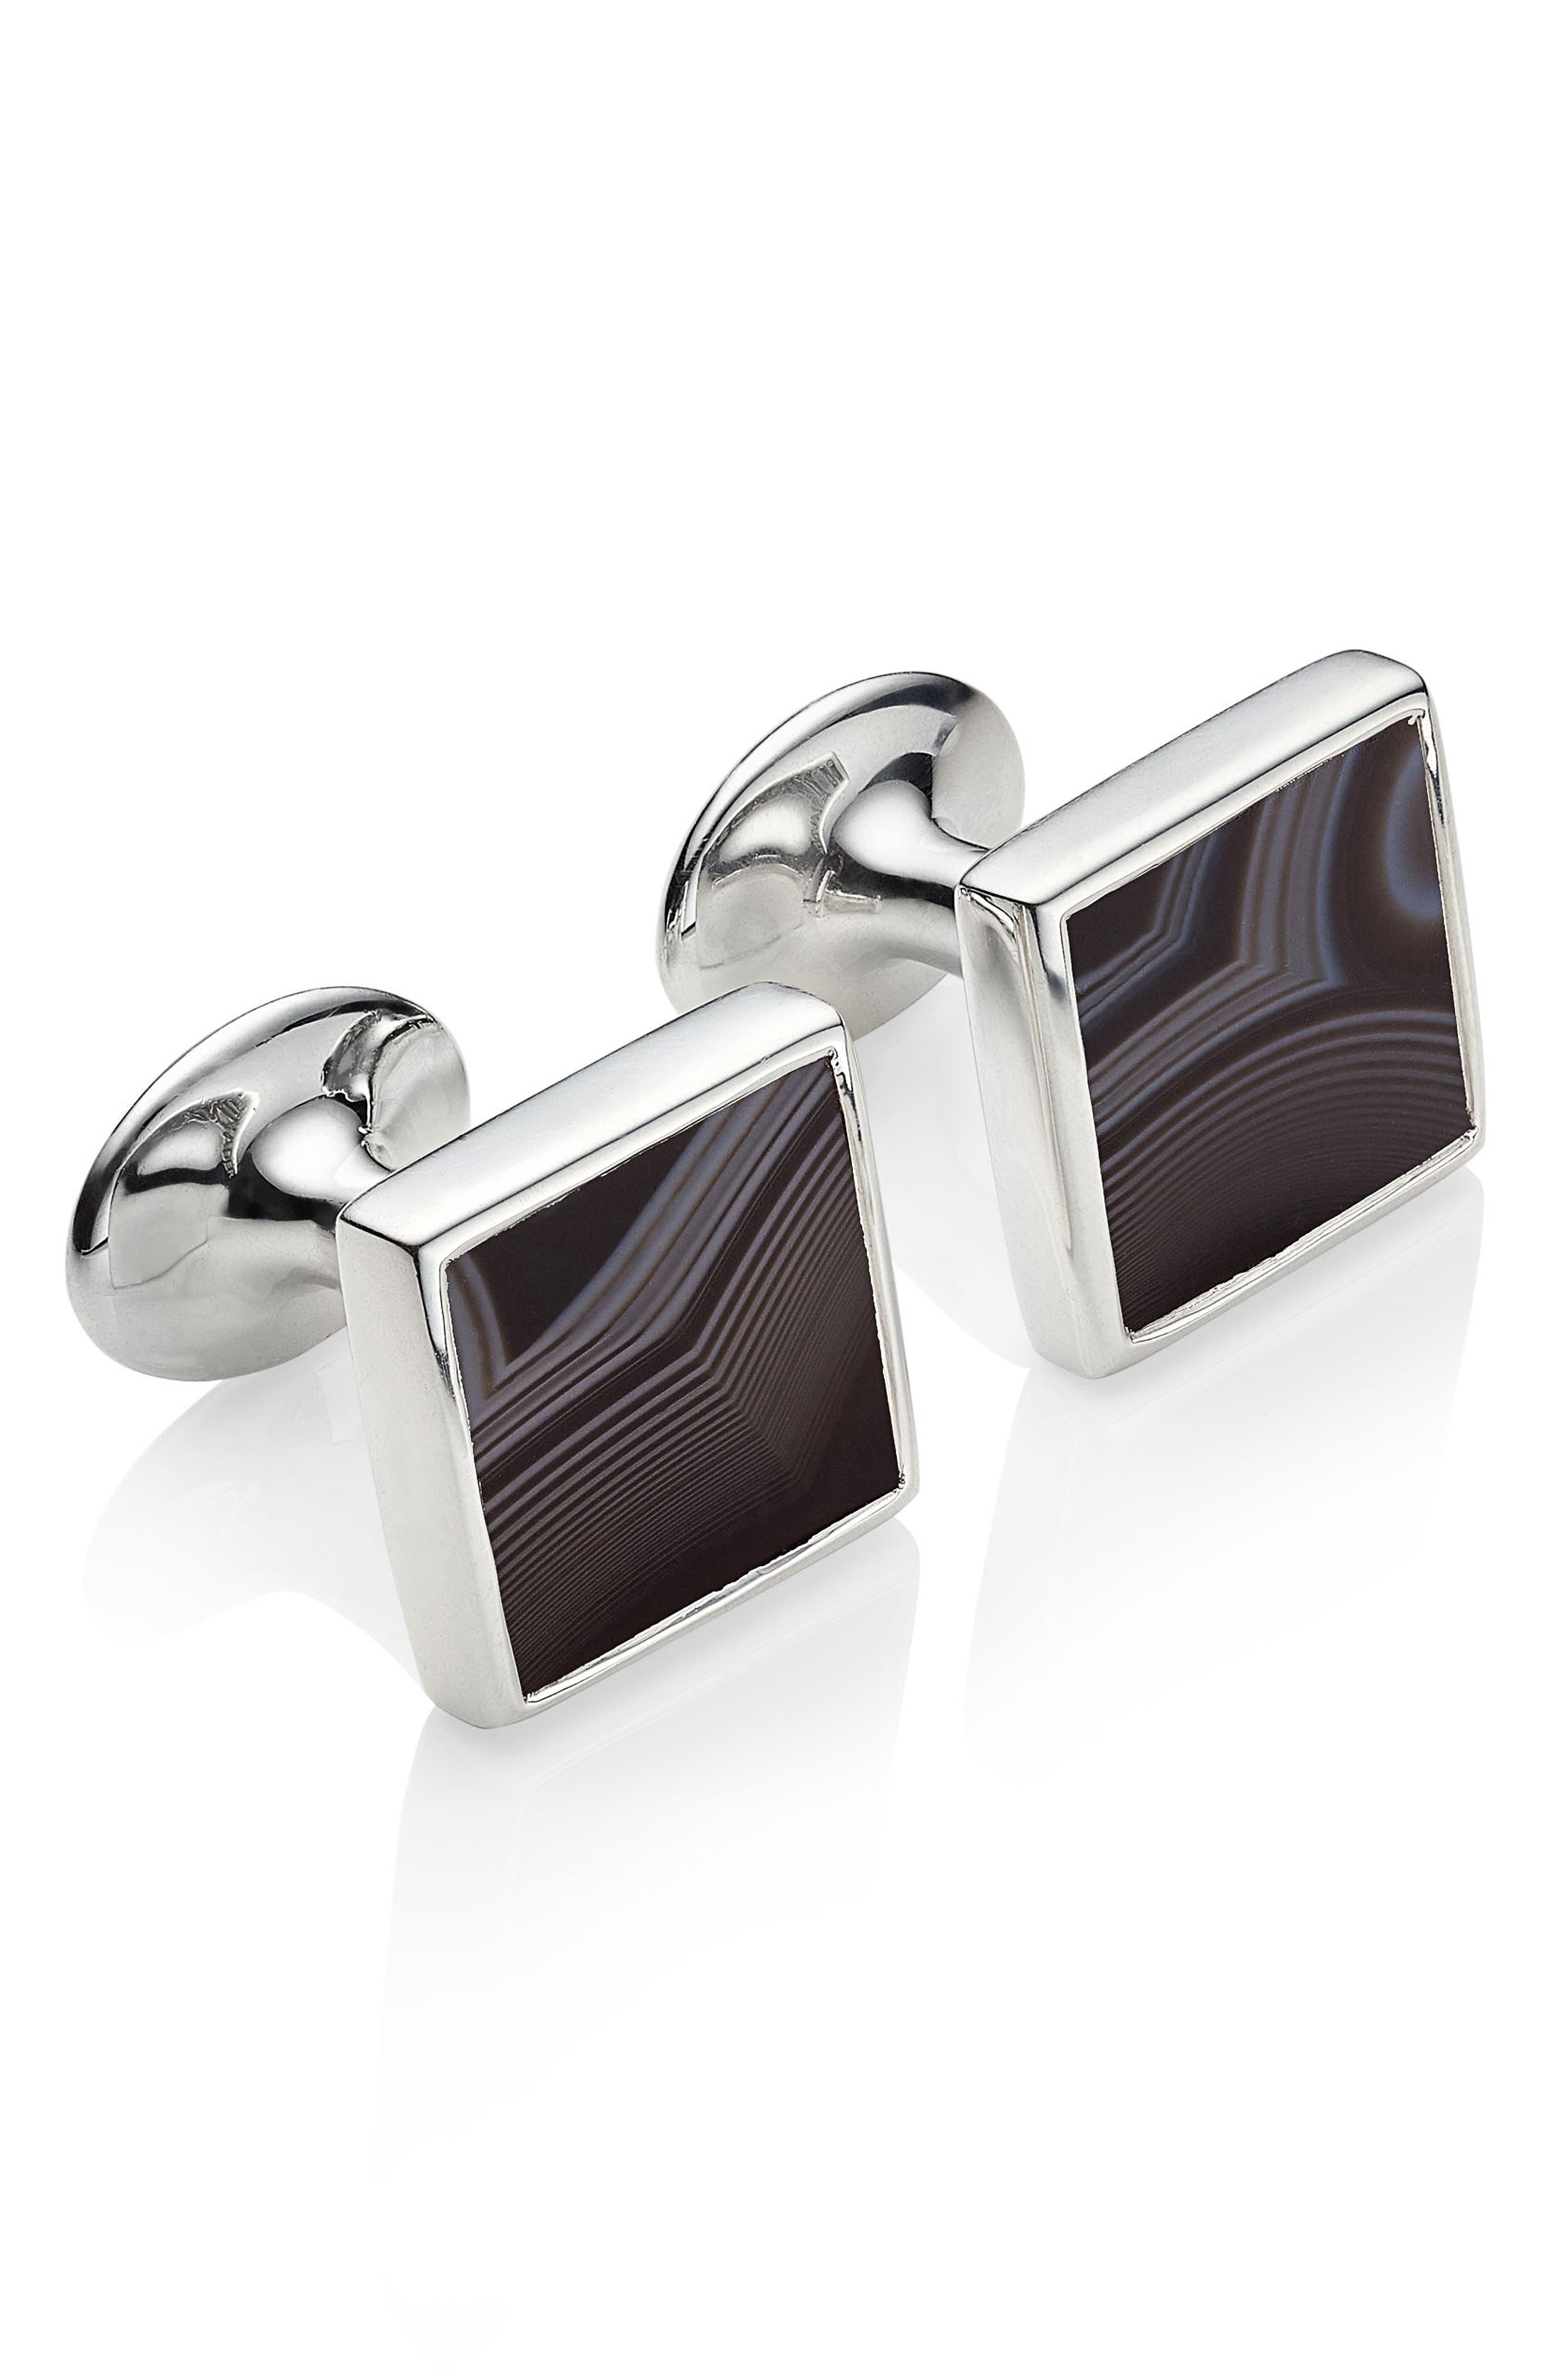 Alta Black Onyx Square Cuff Links,                         Main,                         color, Silver/ Black Line Onyx